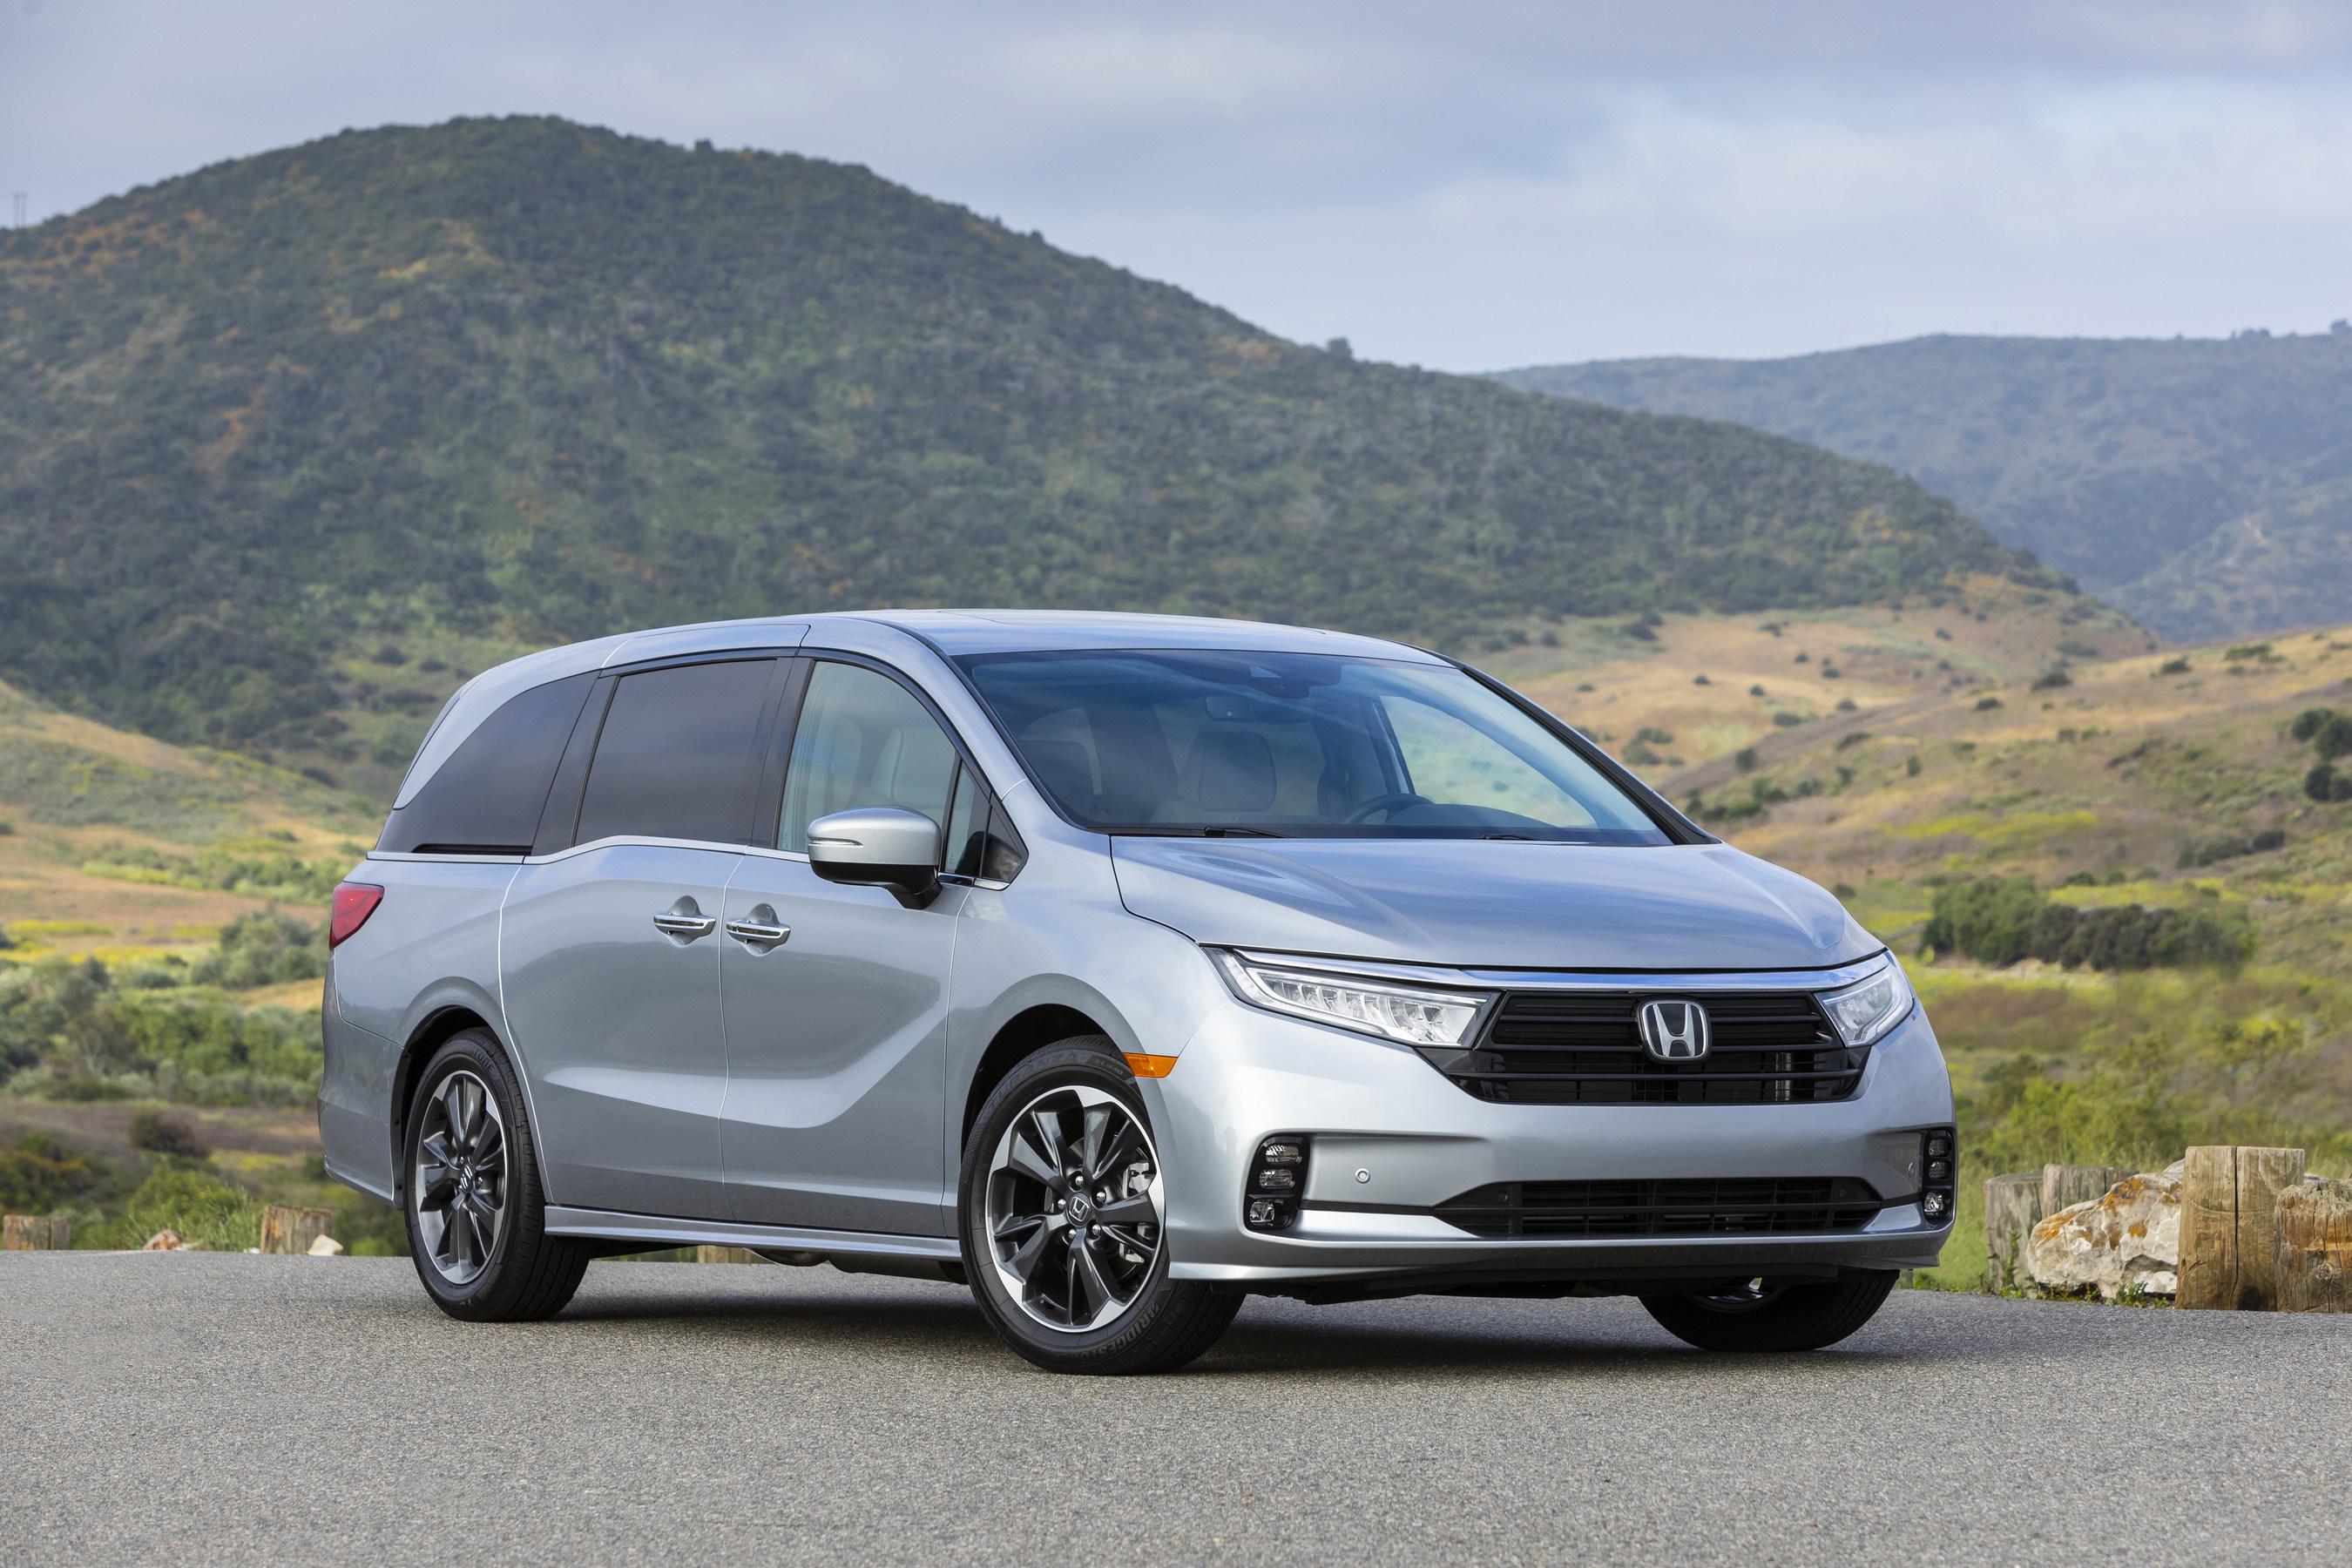 Honda Odyssey 2019 Vs 2021 Performance and New Engine